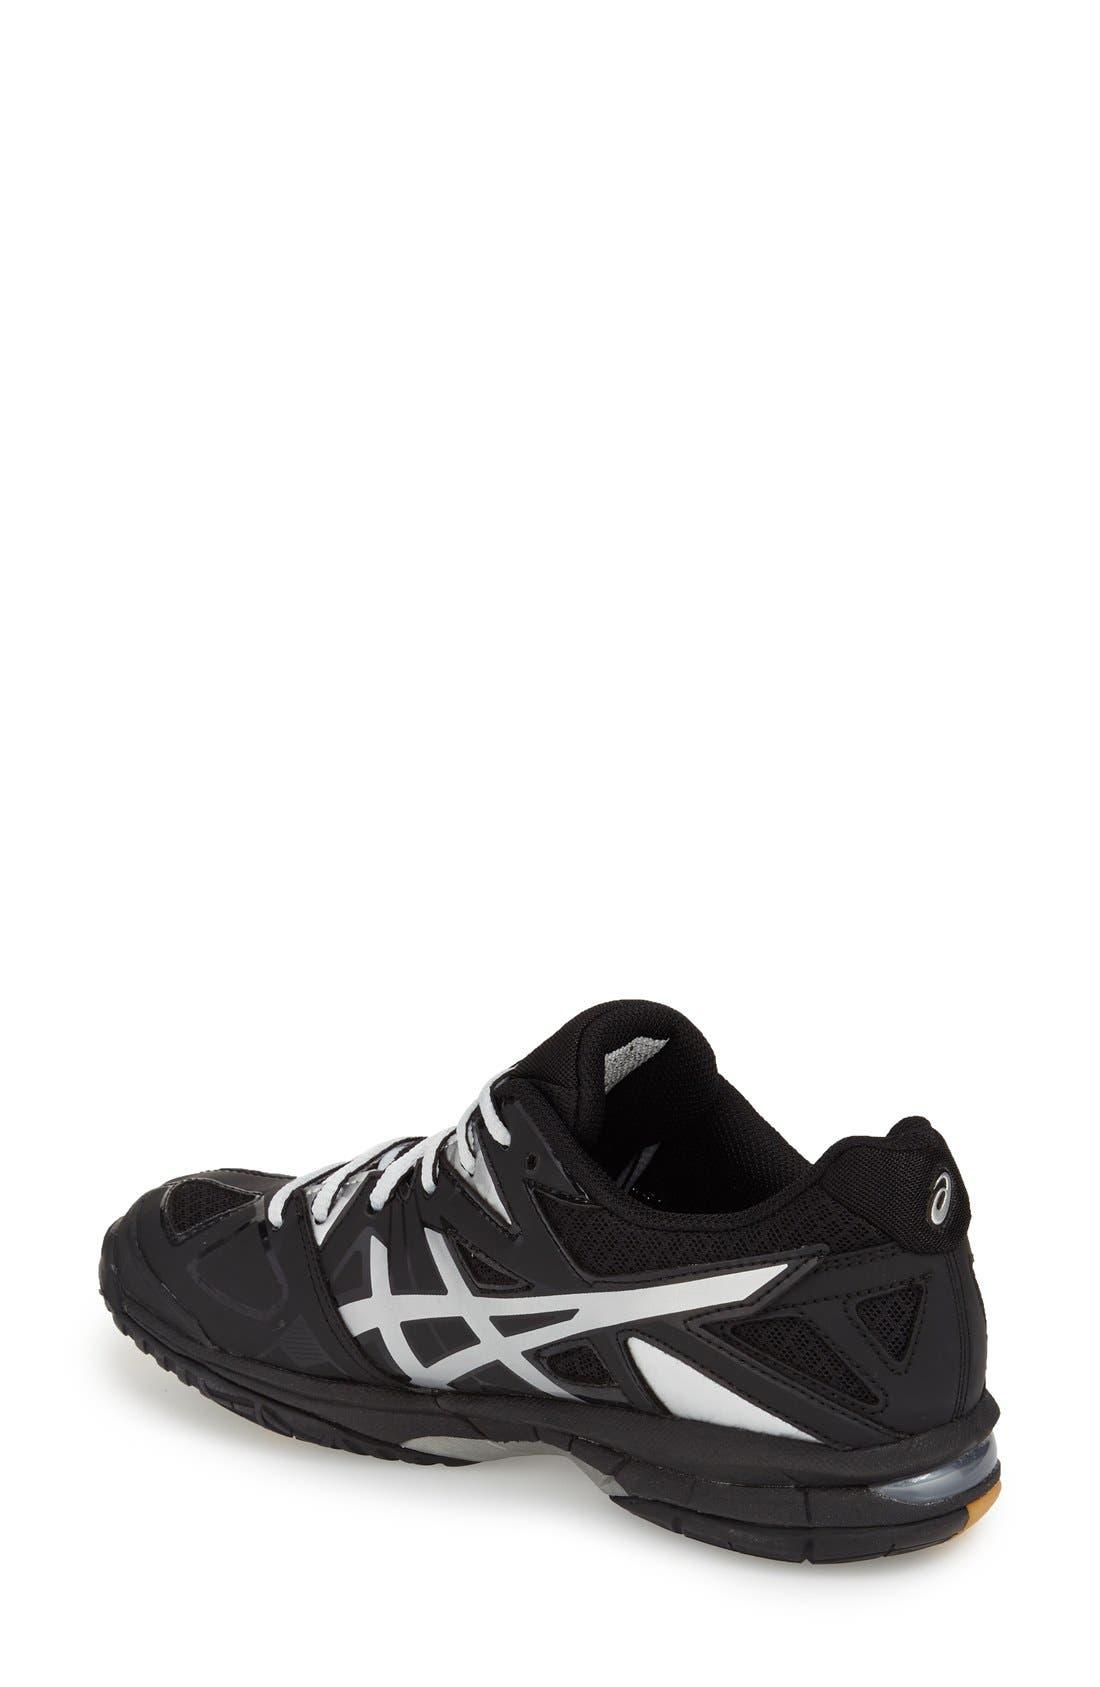 Alternate Image 2  - ASICS® 'GEL-Tactic' Volleyball Shoe (Women)